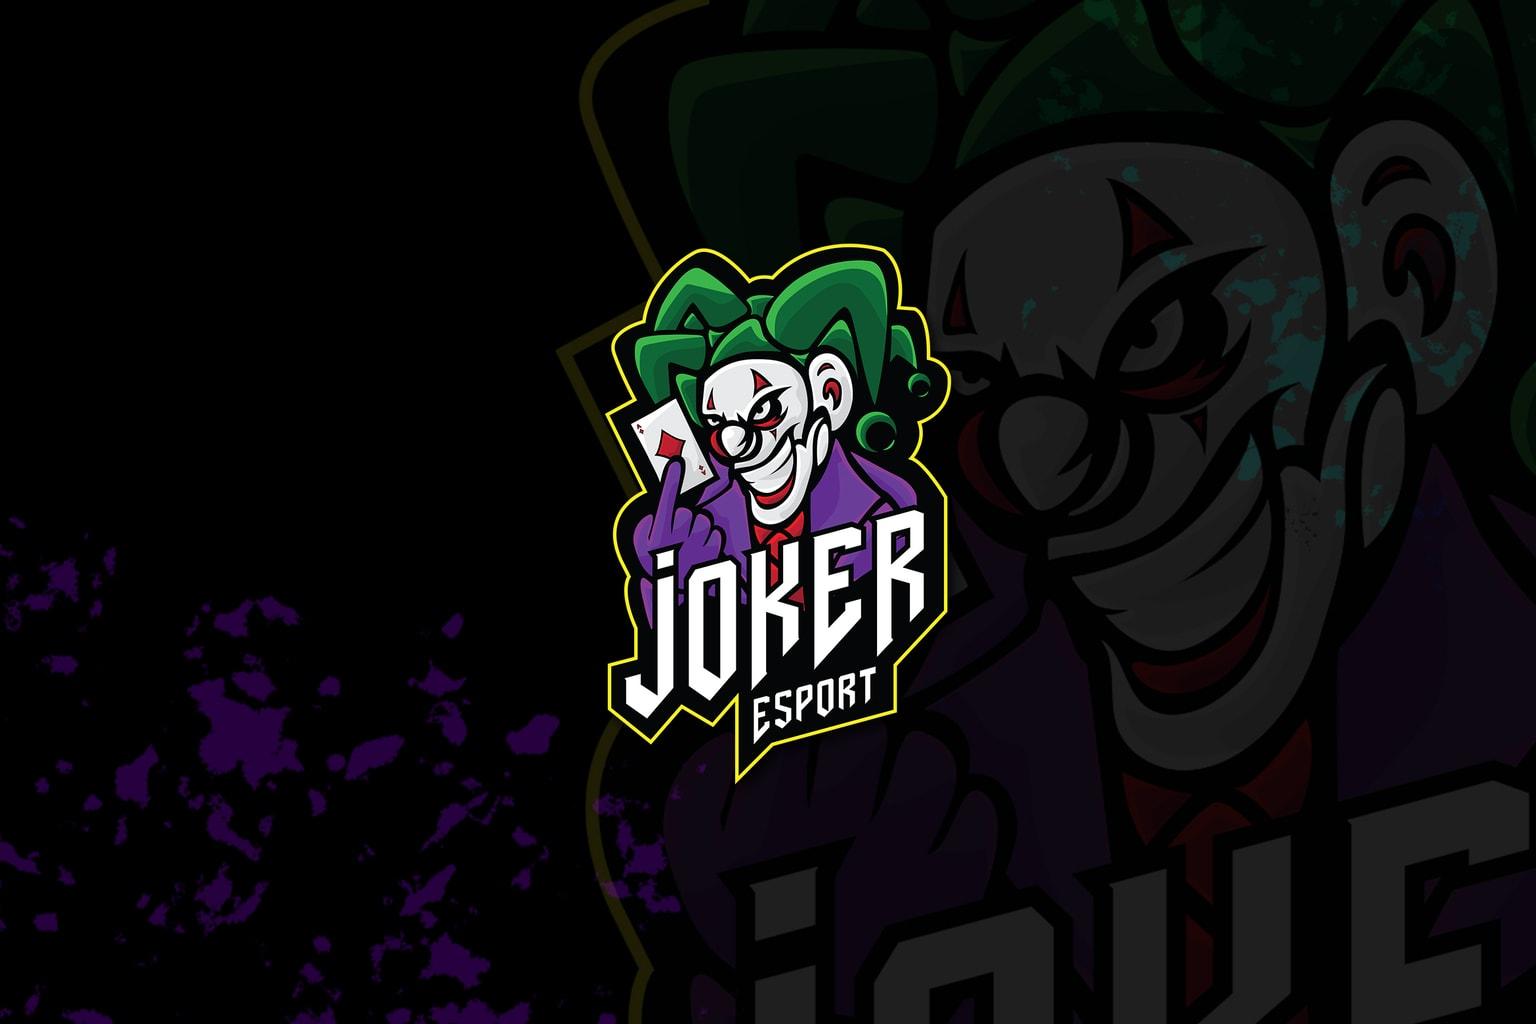 esport logo – evil joker